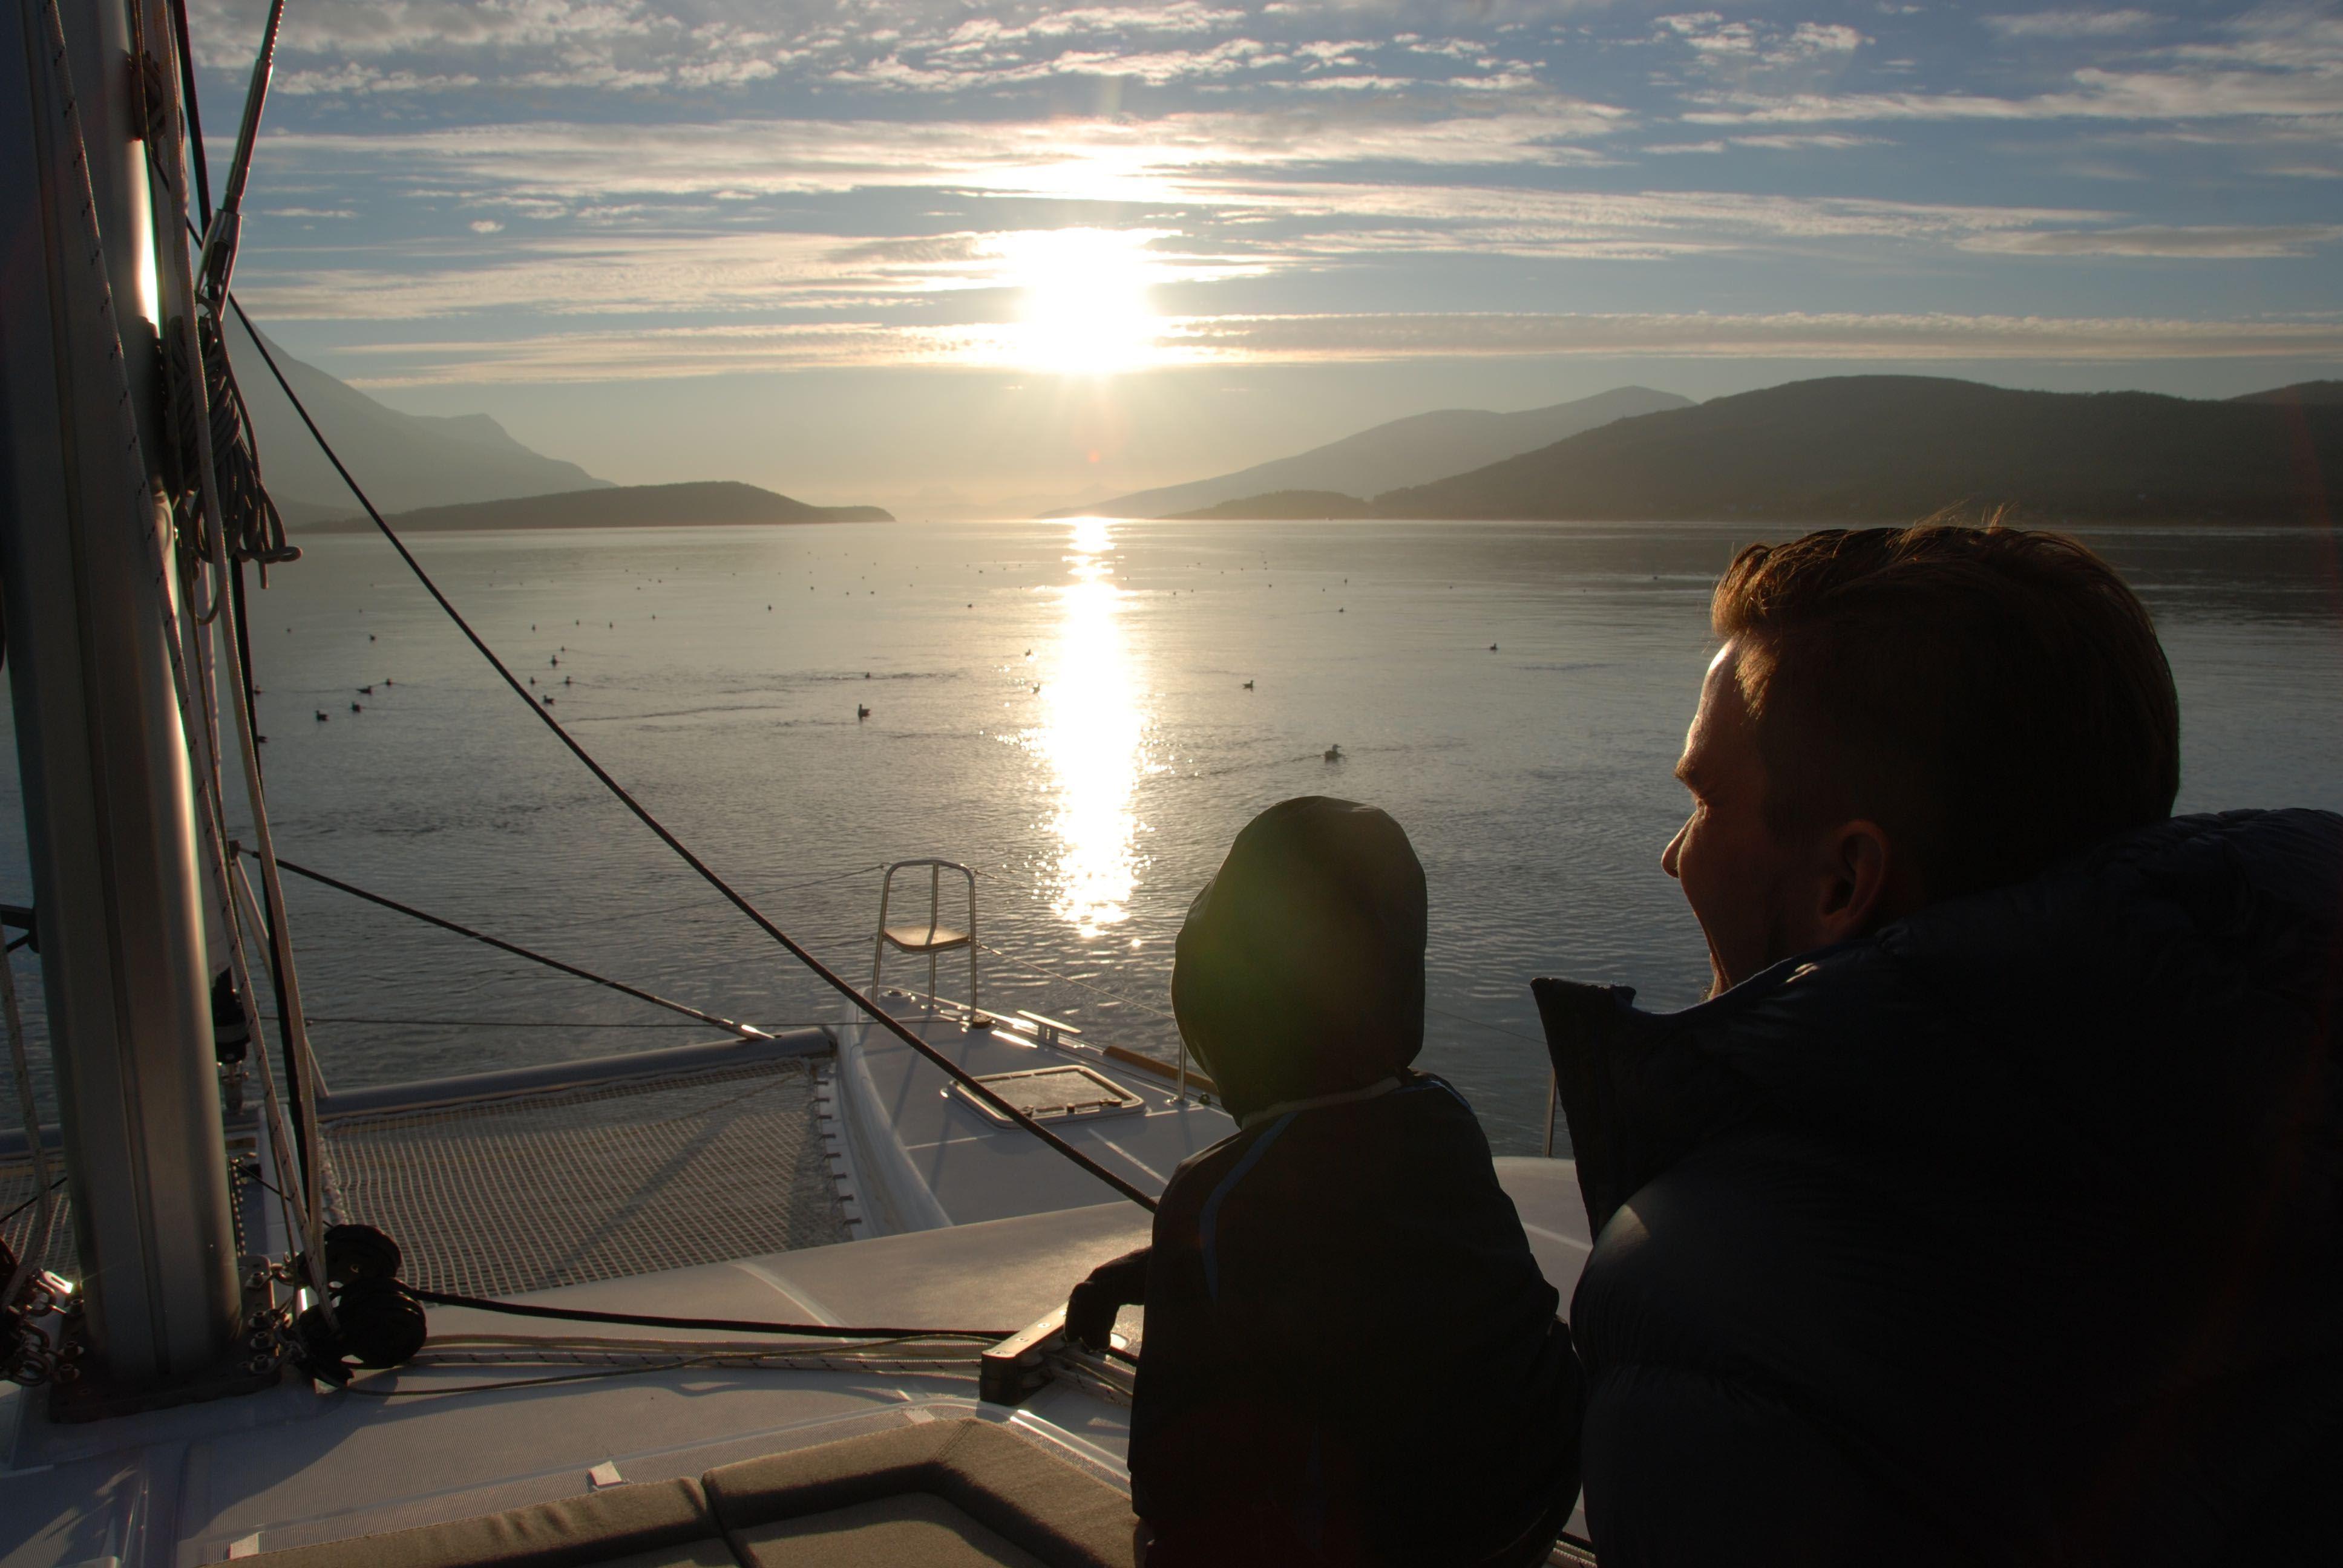 Fjordcruise – Seiltur rundt Tromsøya - Arctic Cruise in Norway